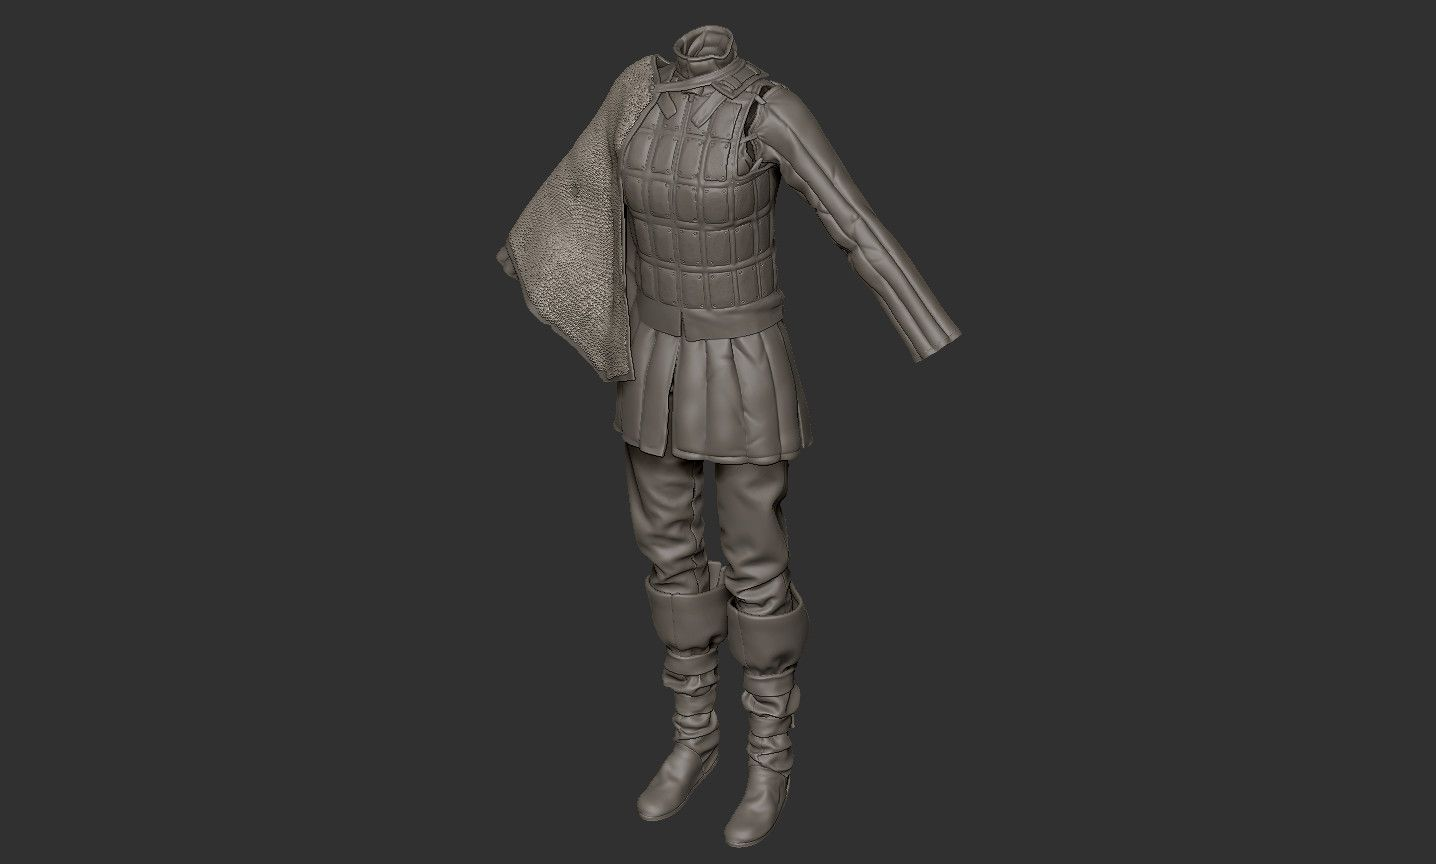 ArtStation - Medieval Light armour, Ethan Noble